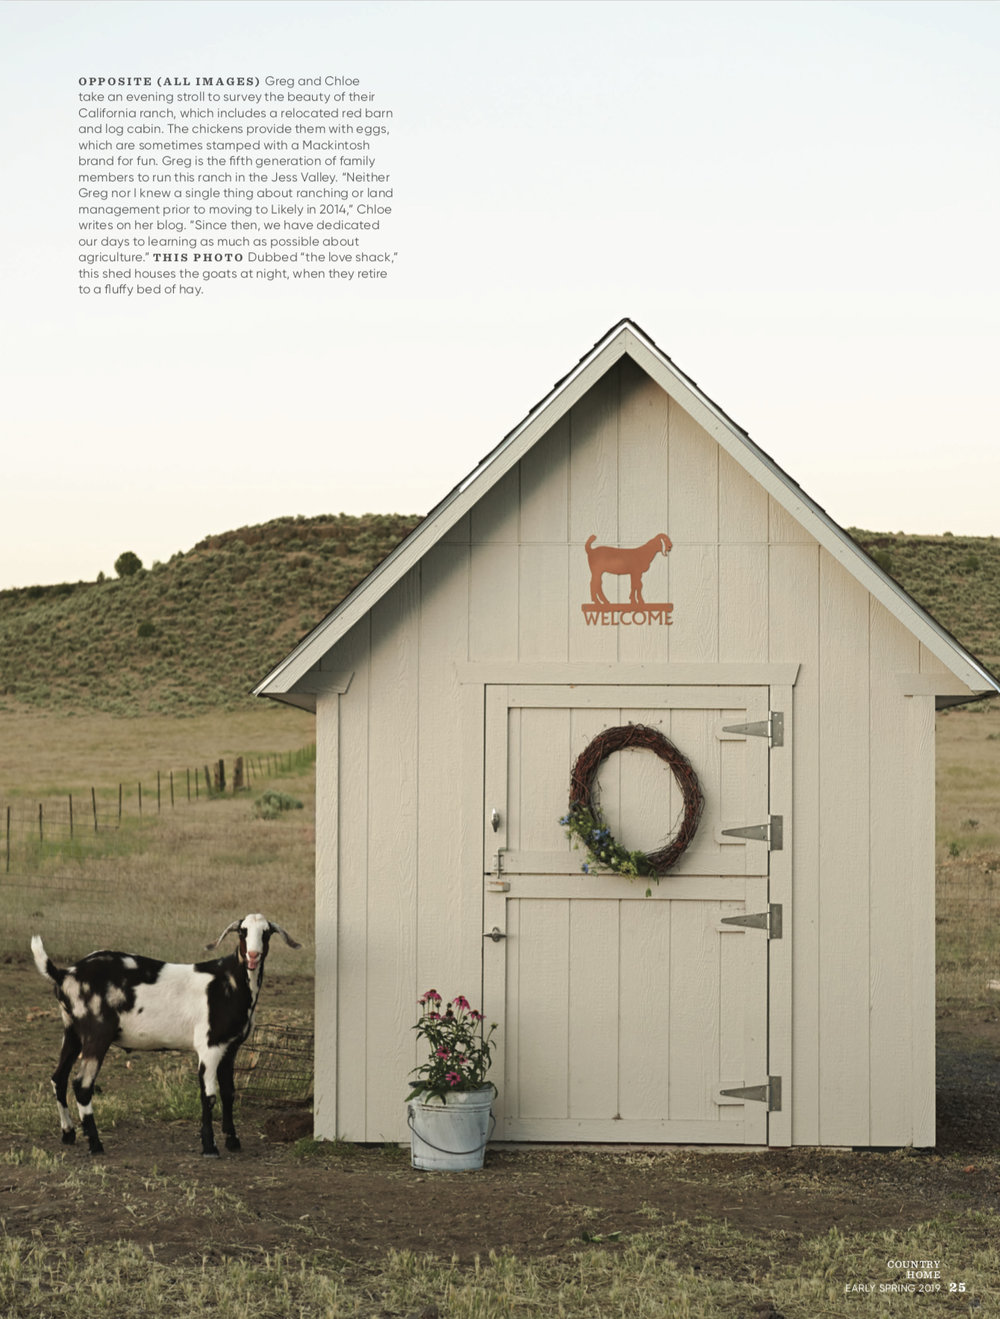 White+goat+barn+with+nubian+goat+ +storage+shed+barn+ideas+ +#farmhousestyle+#goats copy.jpg